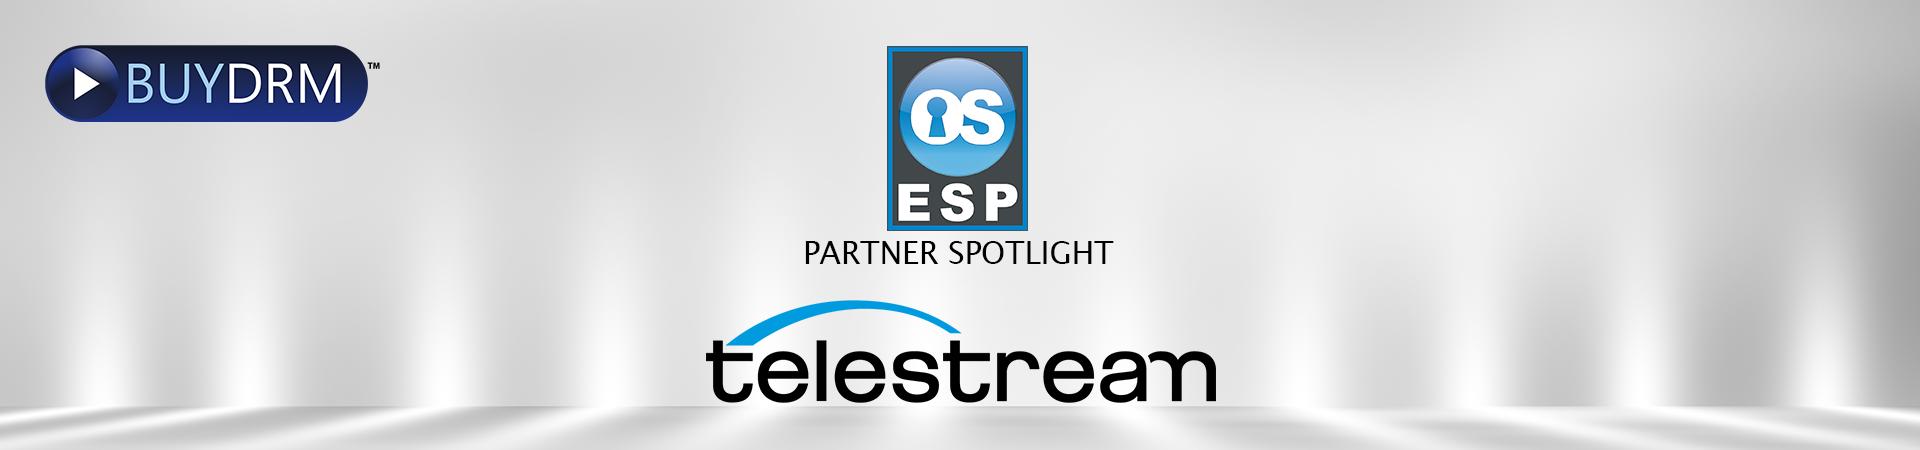 ESPPartnerSpotlight_Telestream_1920x450